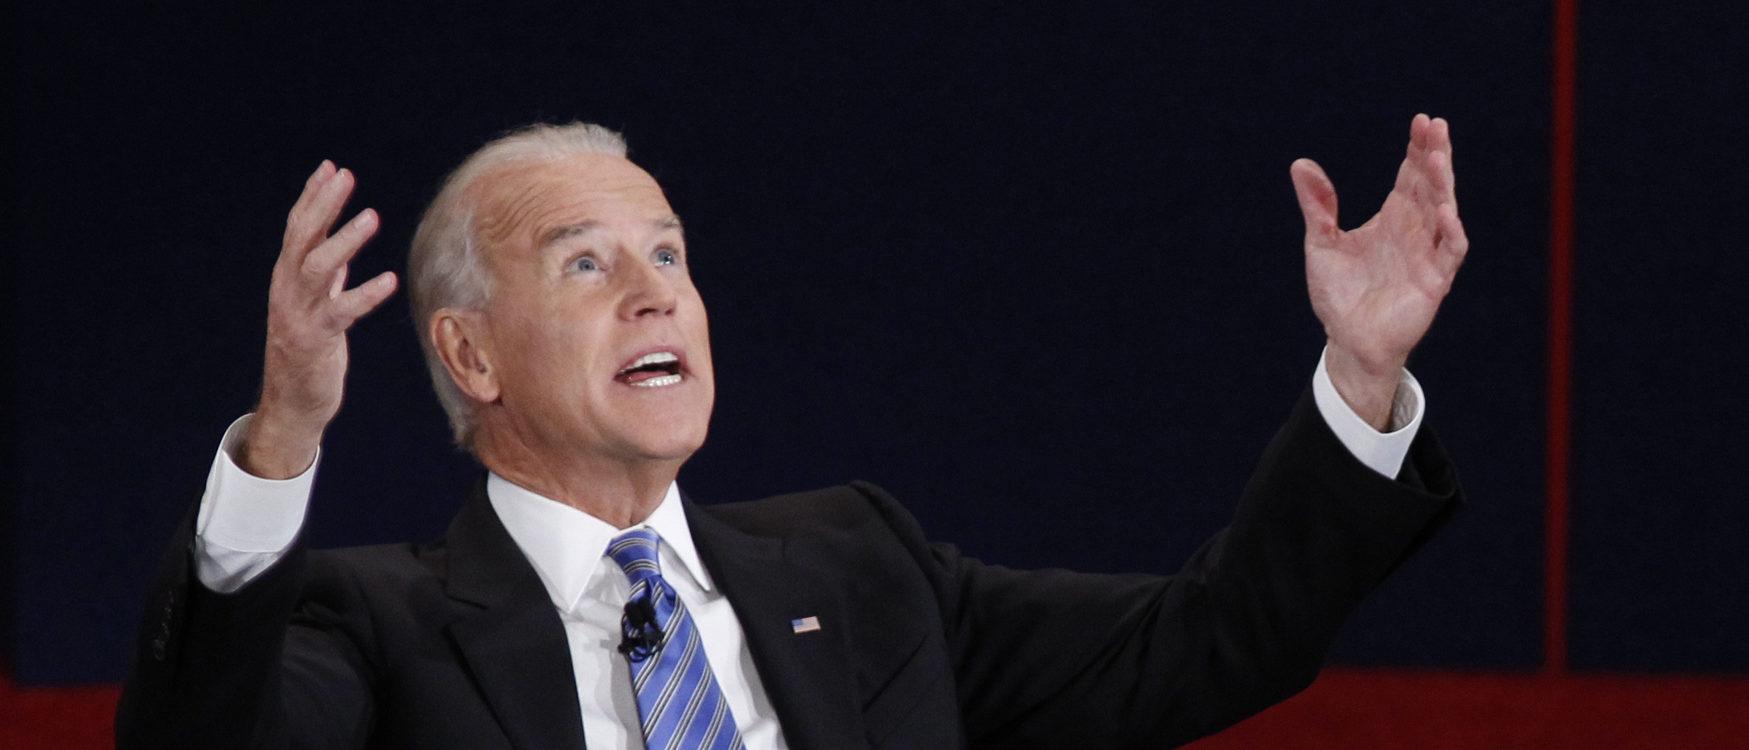 U.S. Vice President Joe Biden (L) makes a point in front of Republican vice presidential nominee Paul Ryan. REUTERS/Jeff Haynes